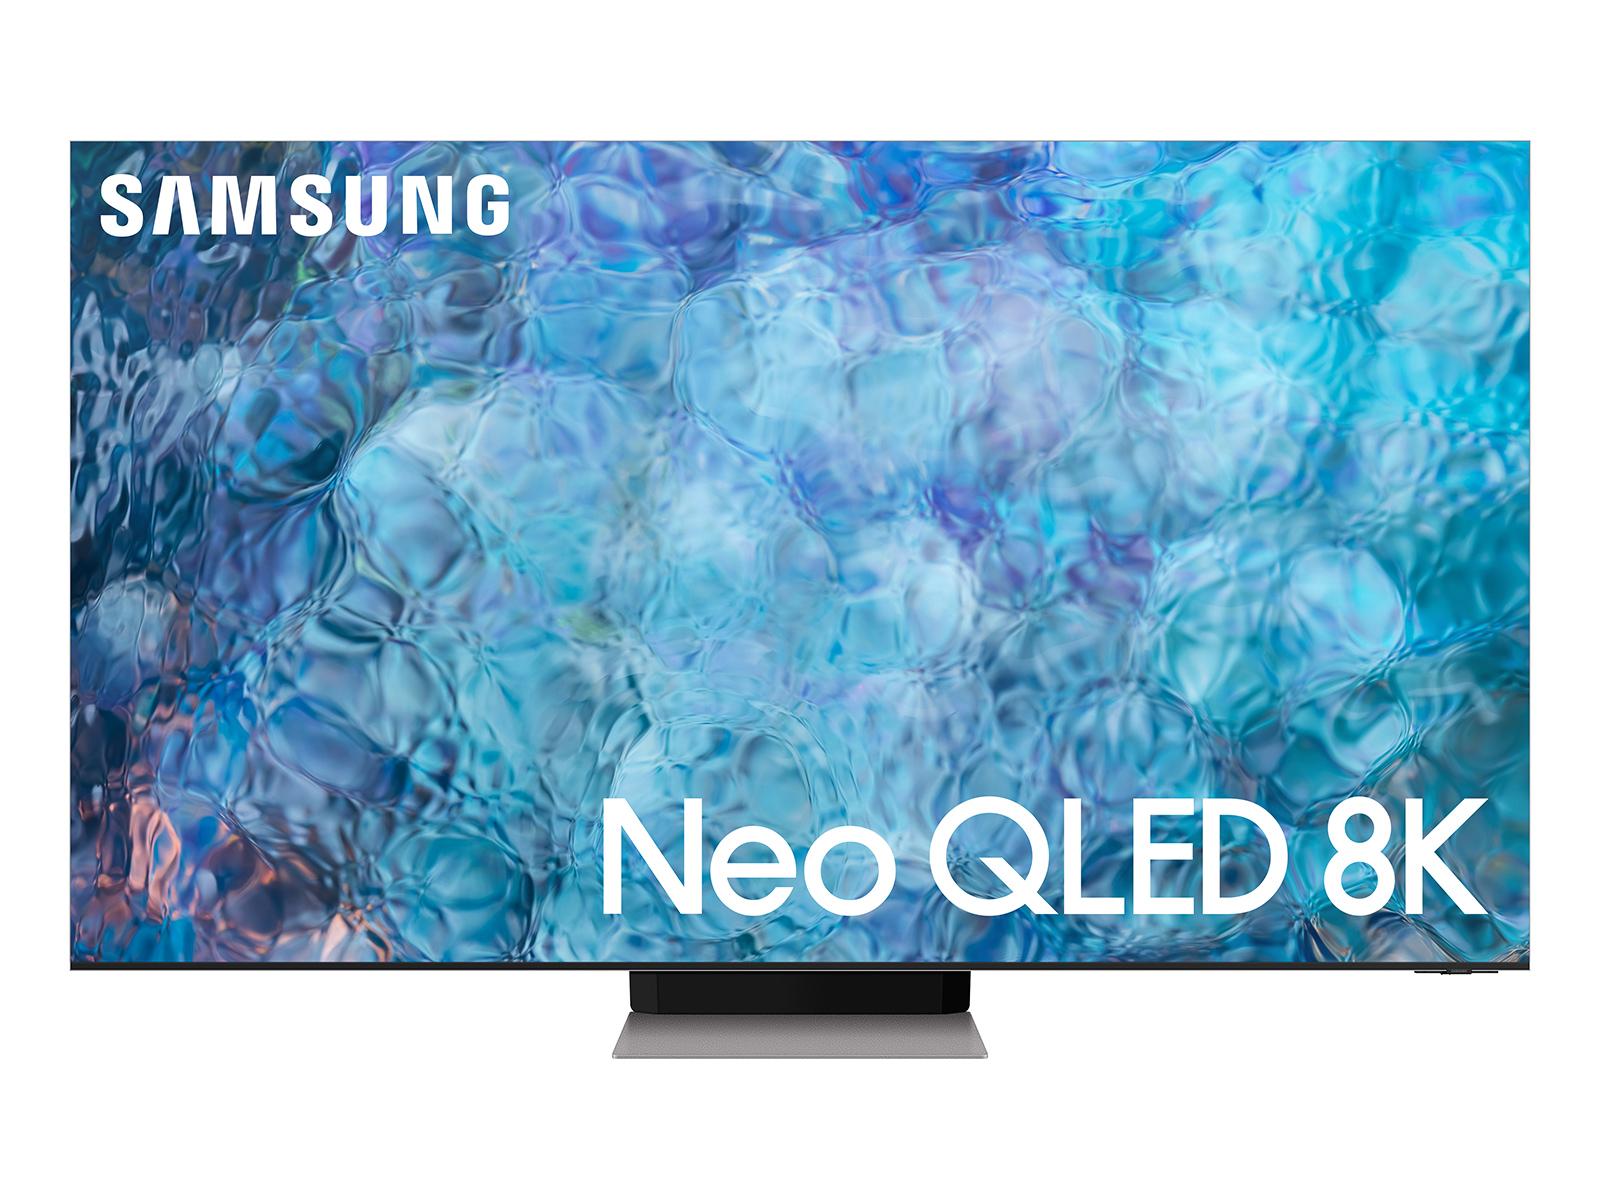 Samsung 75 QN900A Neo QLED 8K Smart TV, QN75QN900AFXZA, 2021